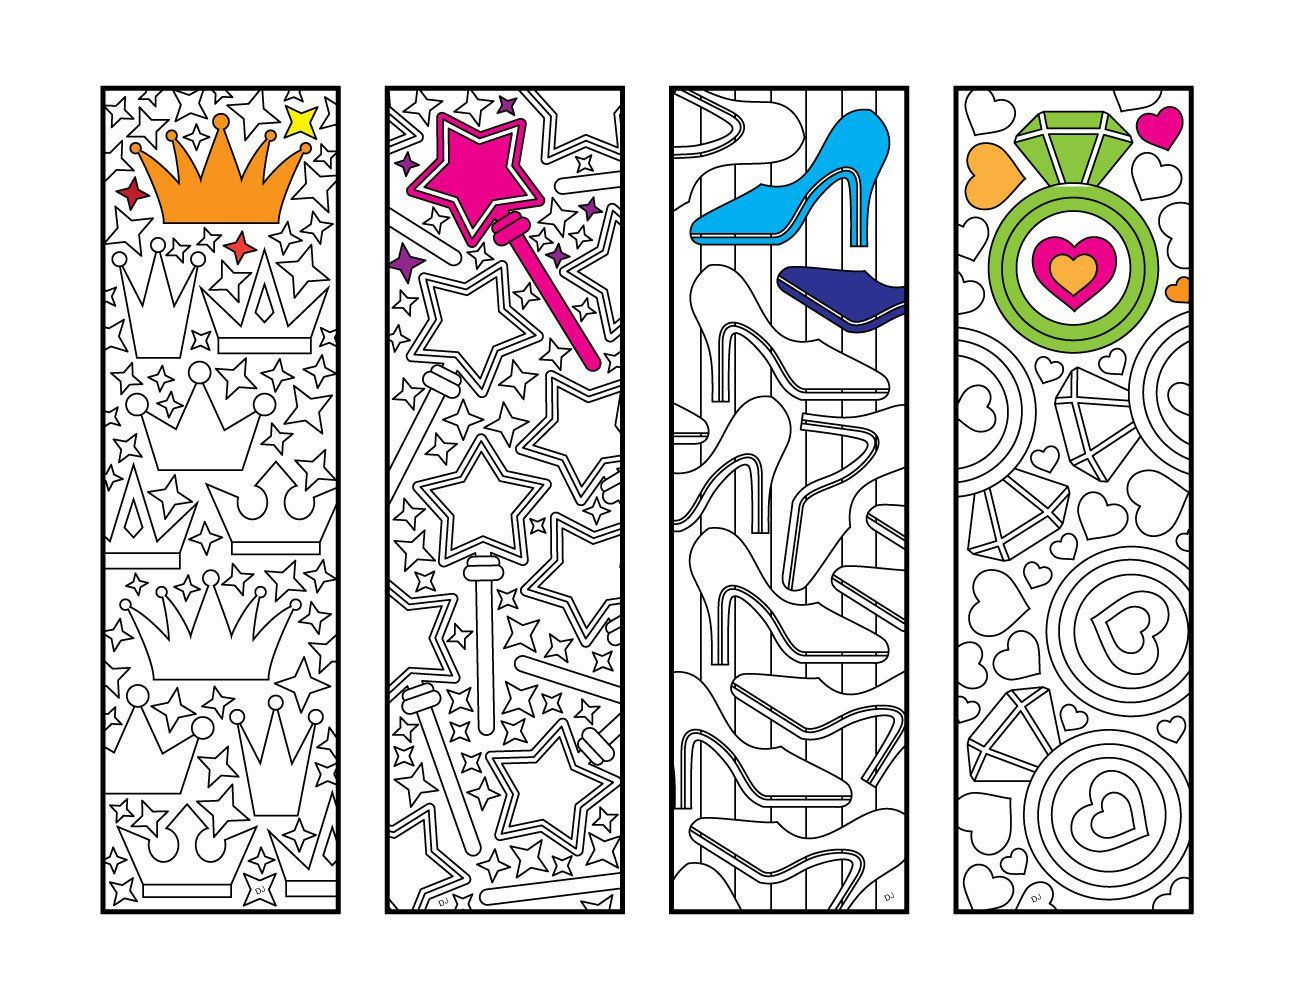 Princess Bookmarks Pdf Zentangle Coloring Page Coloring Pages Coloring Bookmarks Bookmarks Printable